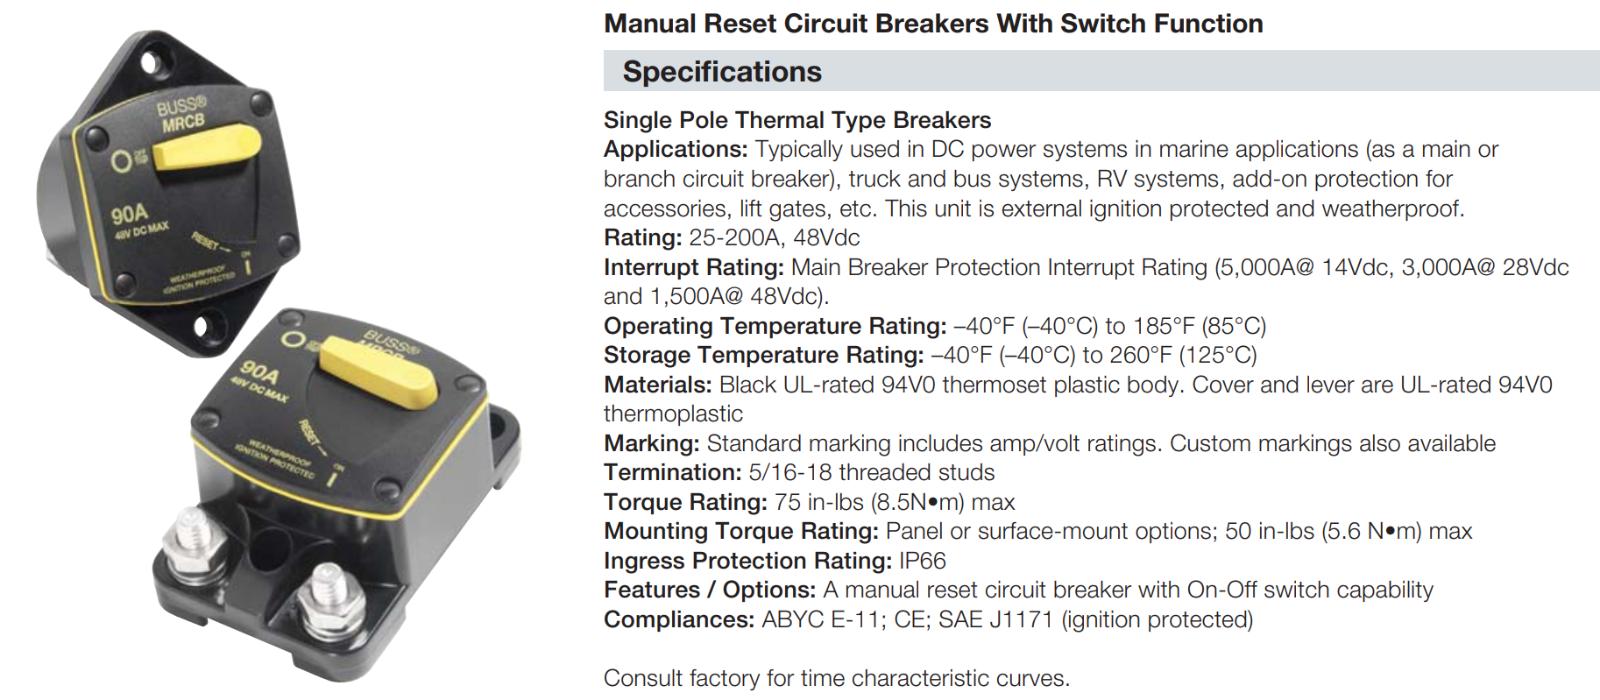 Surface Mount 30 Amps BLUESEA//MARPAC Bussman 187 Series DC Circuit Breaker